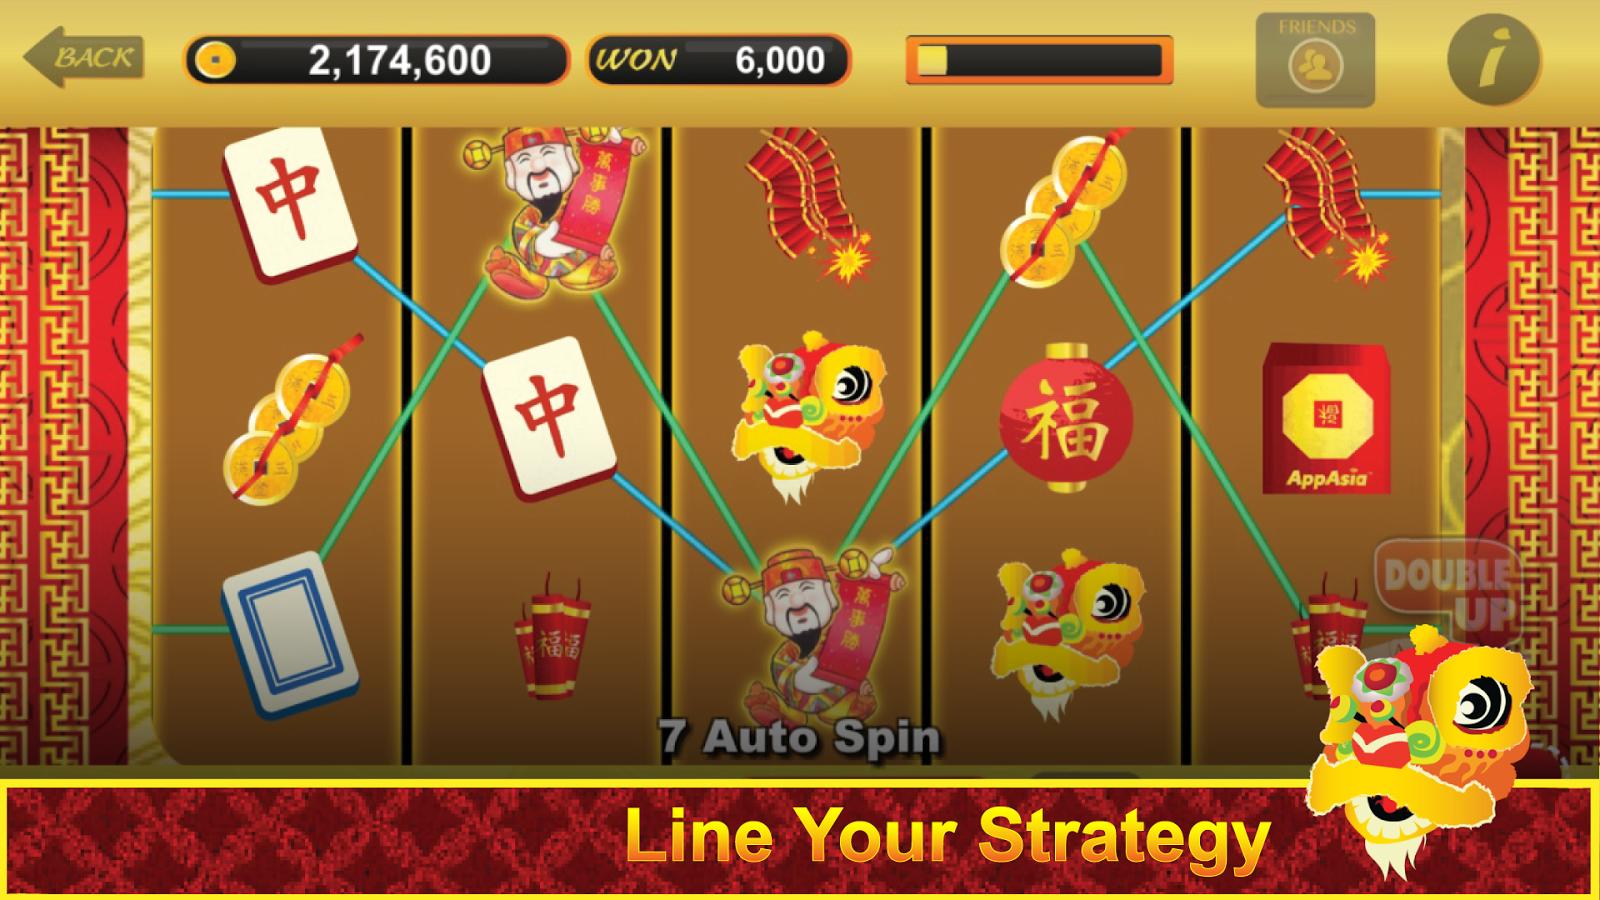 Cny Slots Gong Xi Fa Cai 12 Apk Download Android Casino